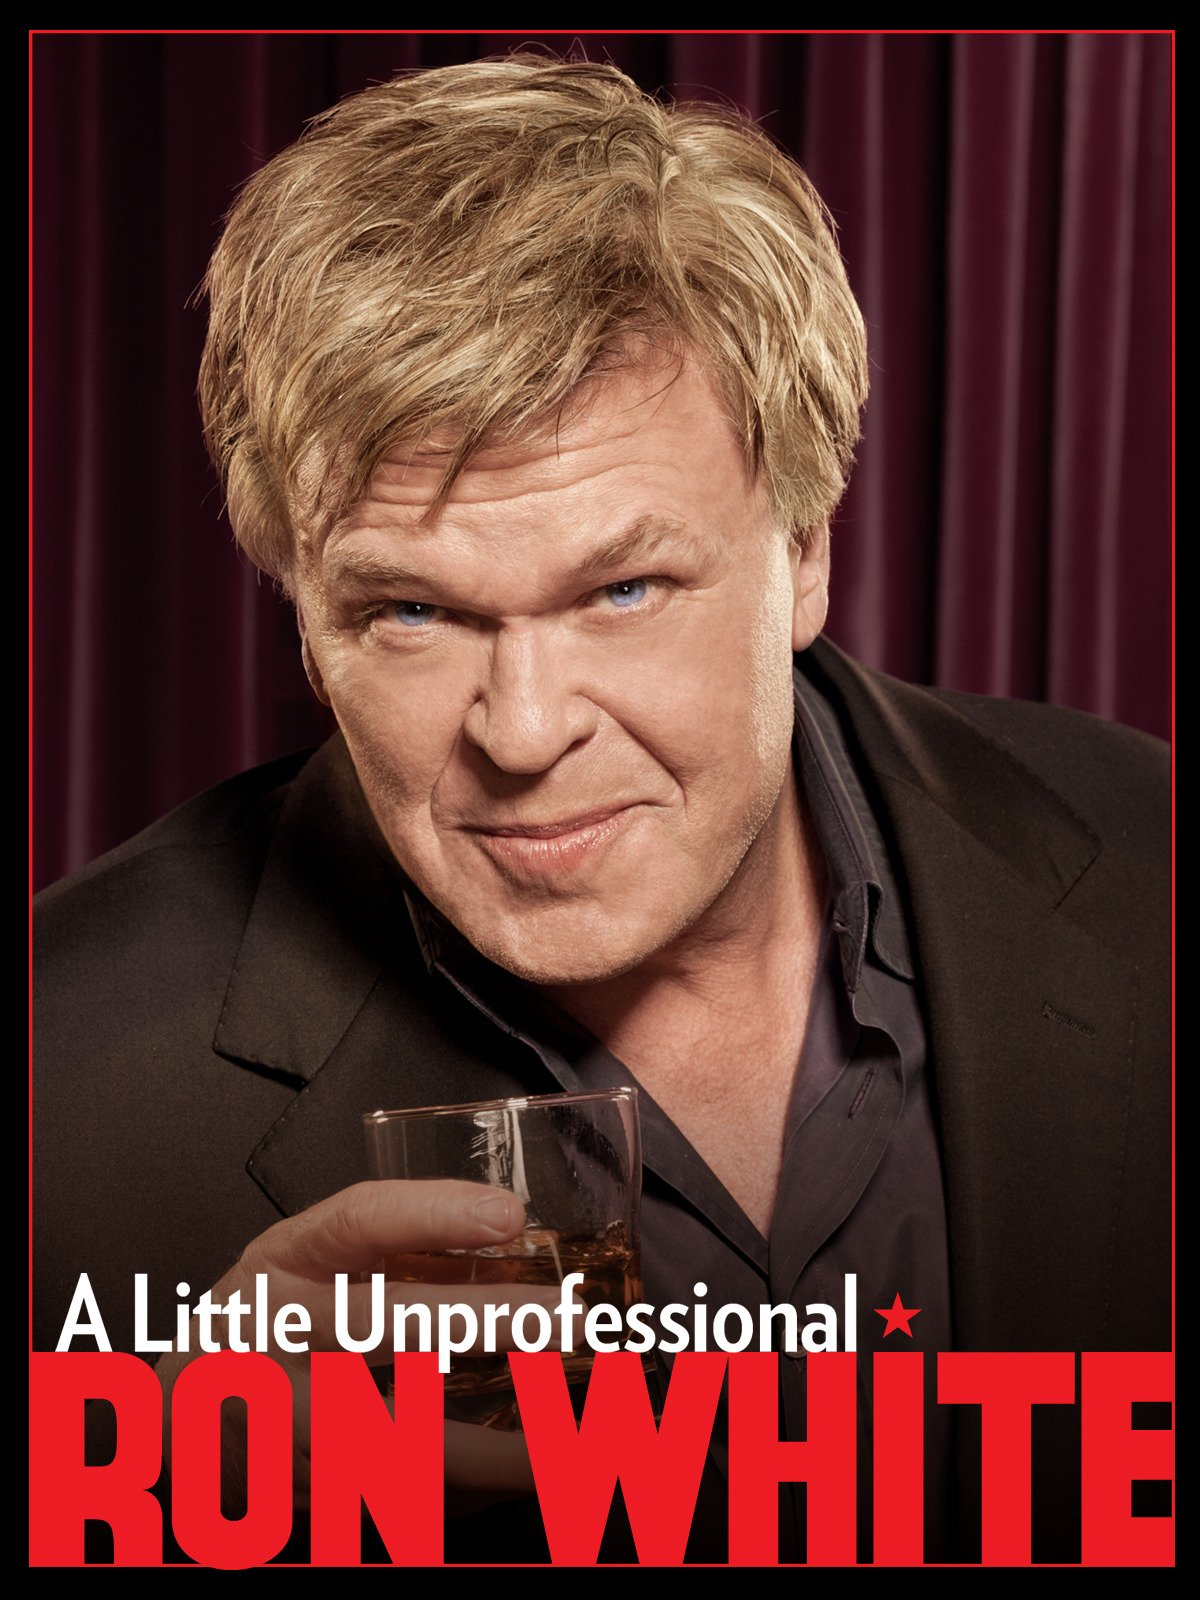 Ron White: A Little Unprofessional on Amazon Prime Video UK